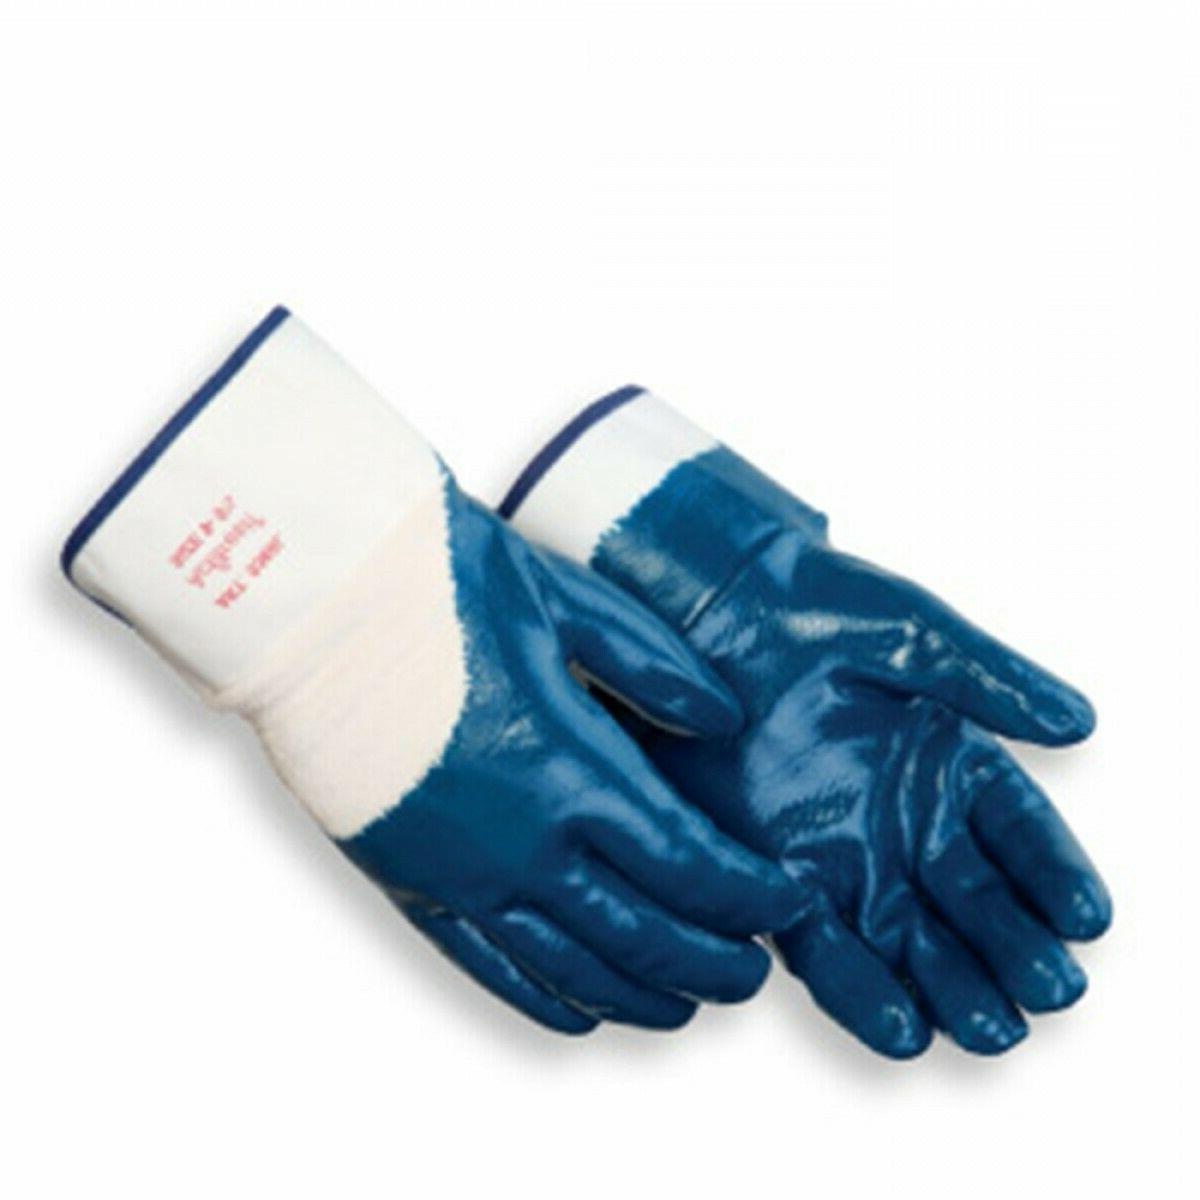 9460sp x large nitrile gloves fully coated